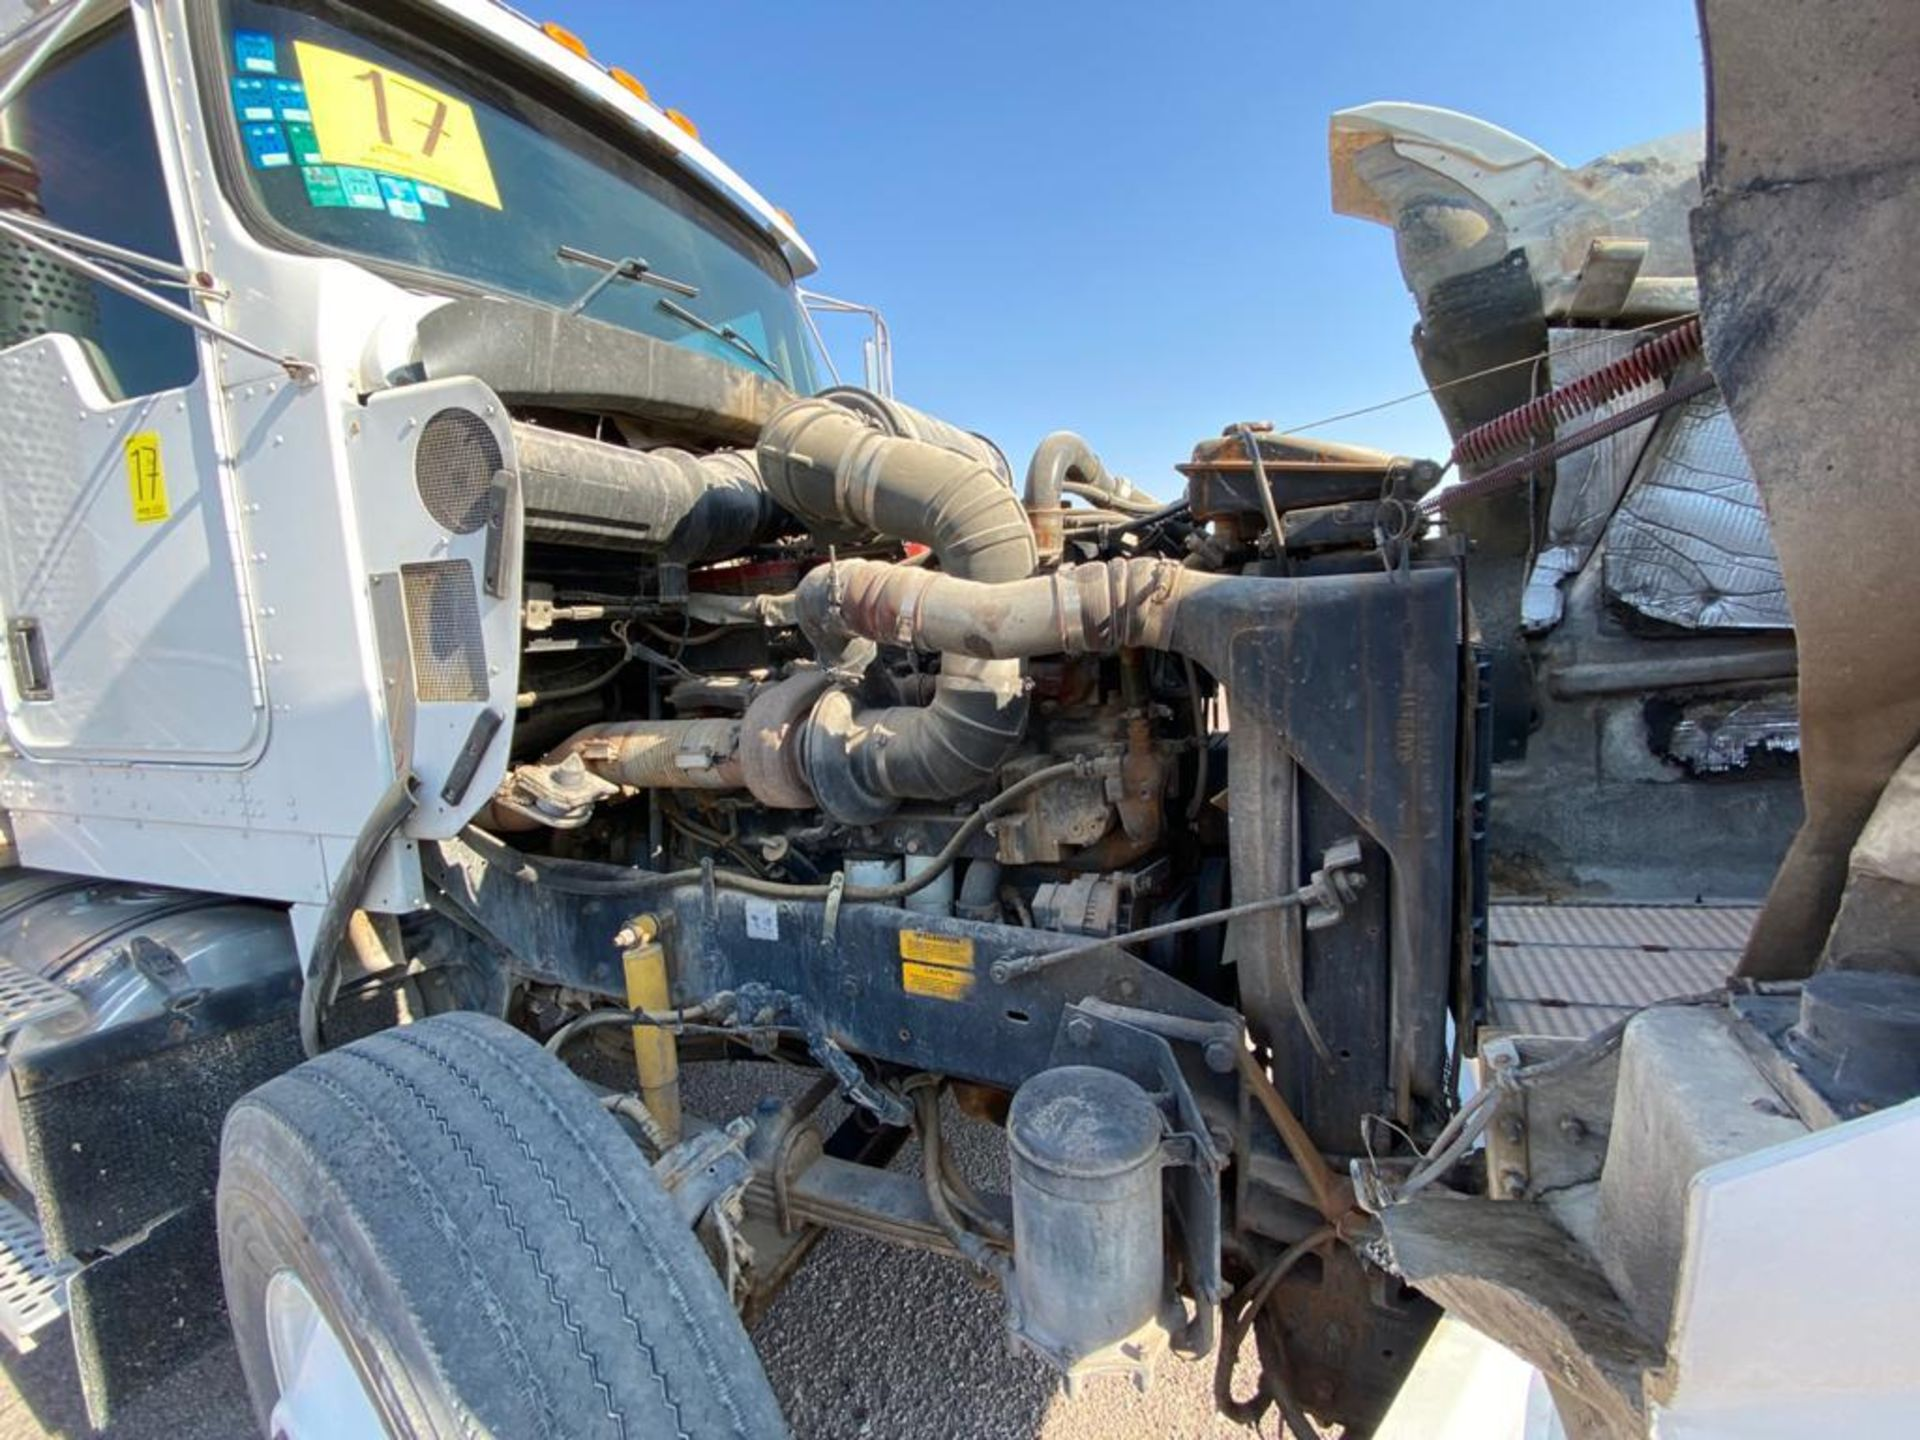 1998 Kenworth Sleeper Truck Tractor, standard transmission of 18 speeds - Image 53 of 55